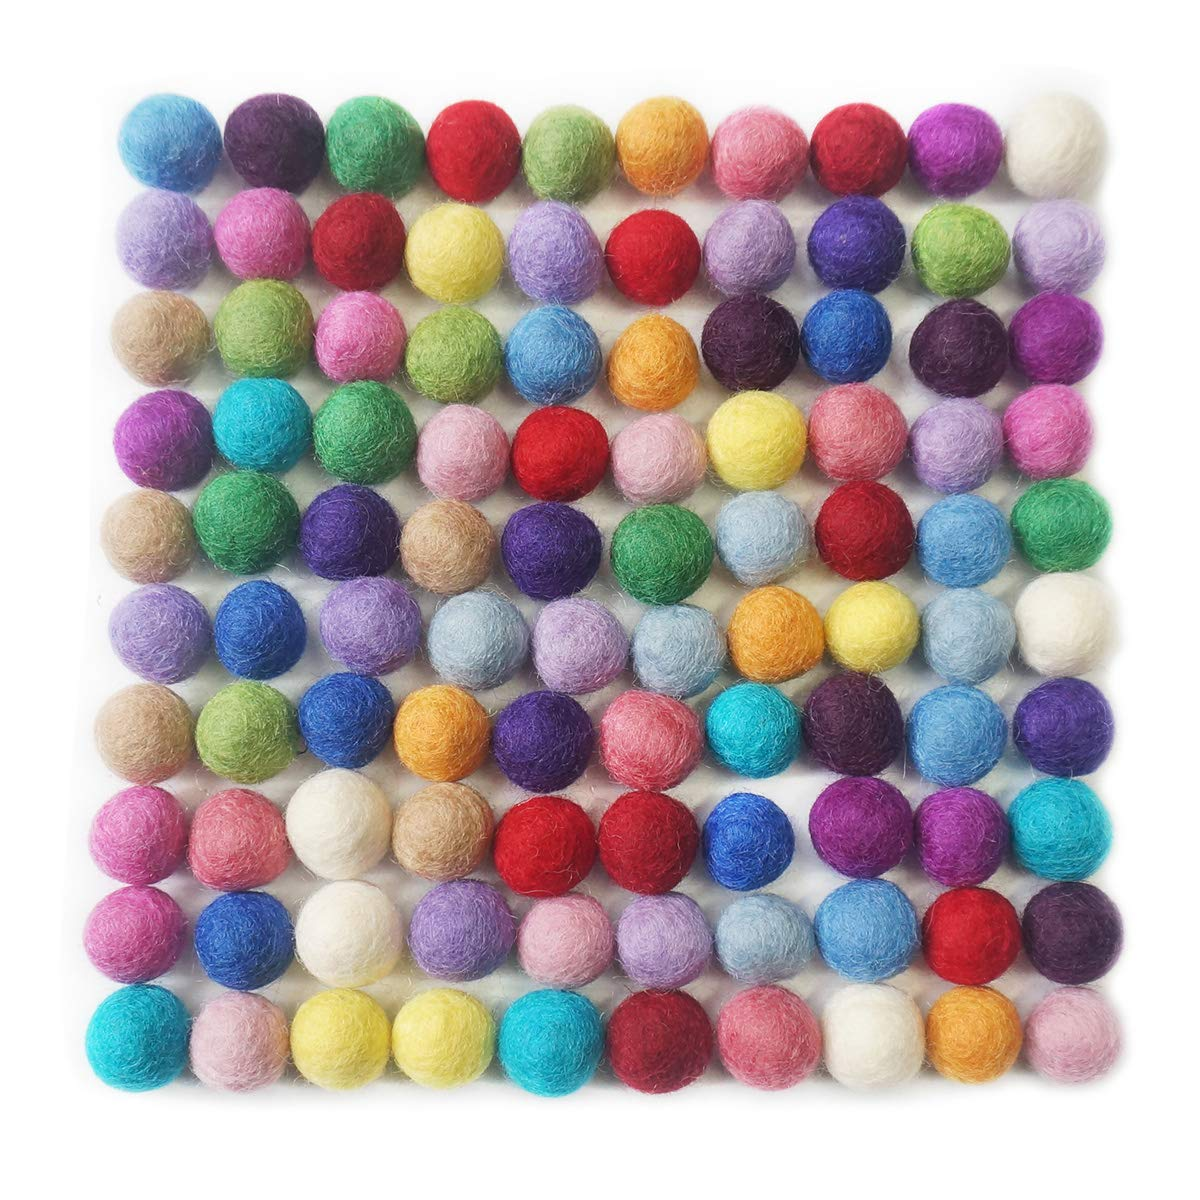 YXJD 100pcs Filzkugel 100/% Wolle Ball 20mm Filzperlen Mehrfarbig zum Basteln Zimmer Party Hochzeit Deko